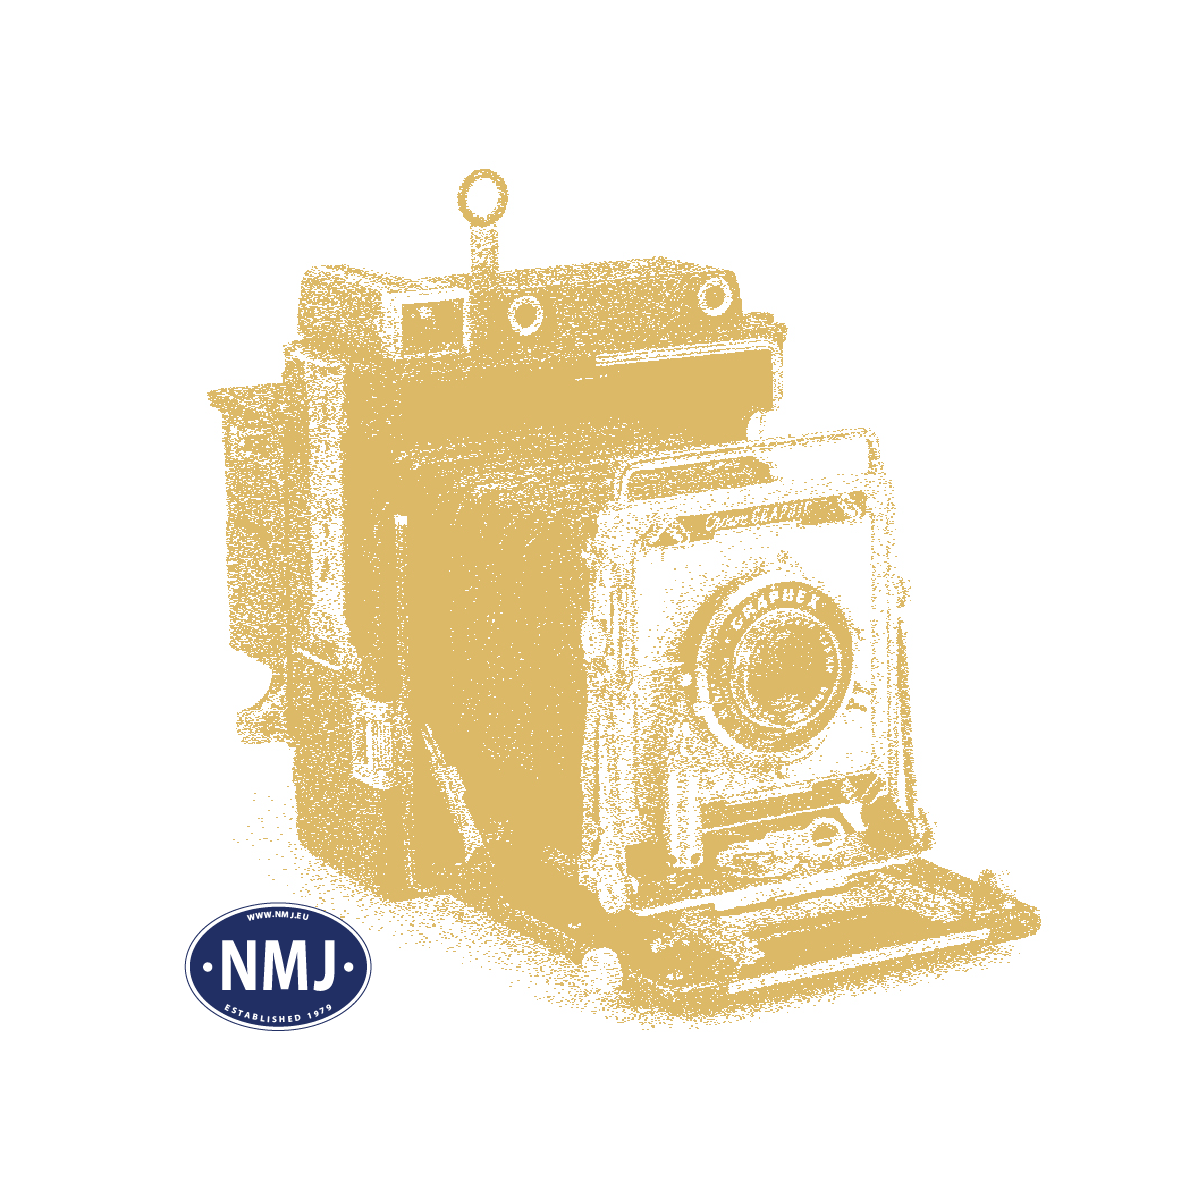 NMJT90207 - NMJ Topline MAV M61.005, DCC Sound